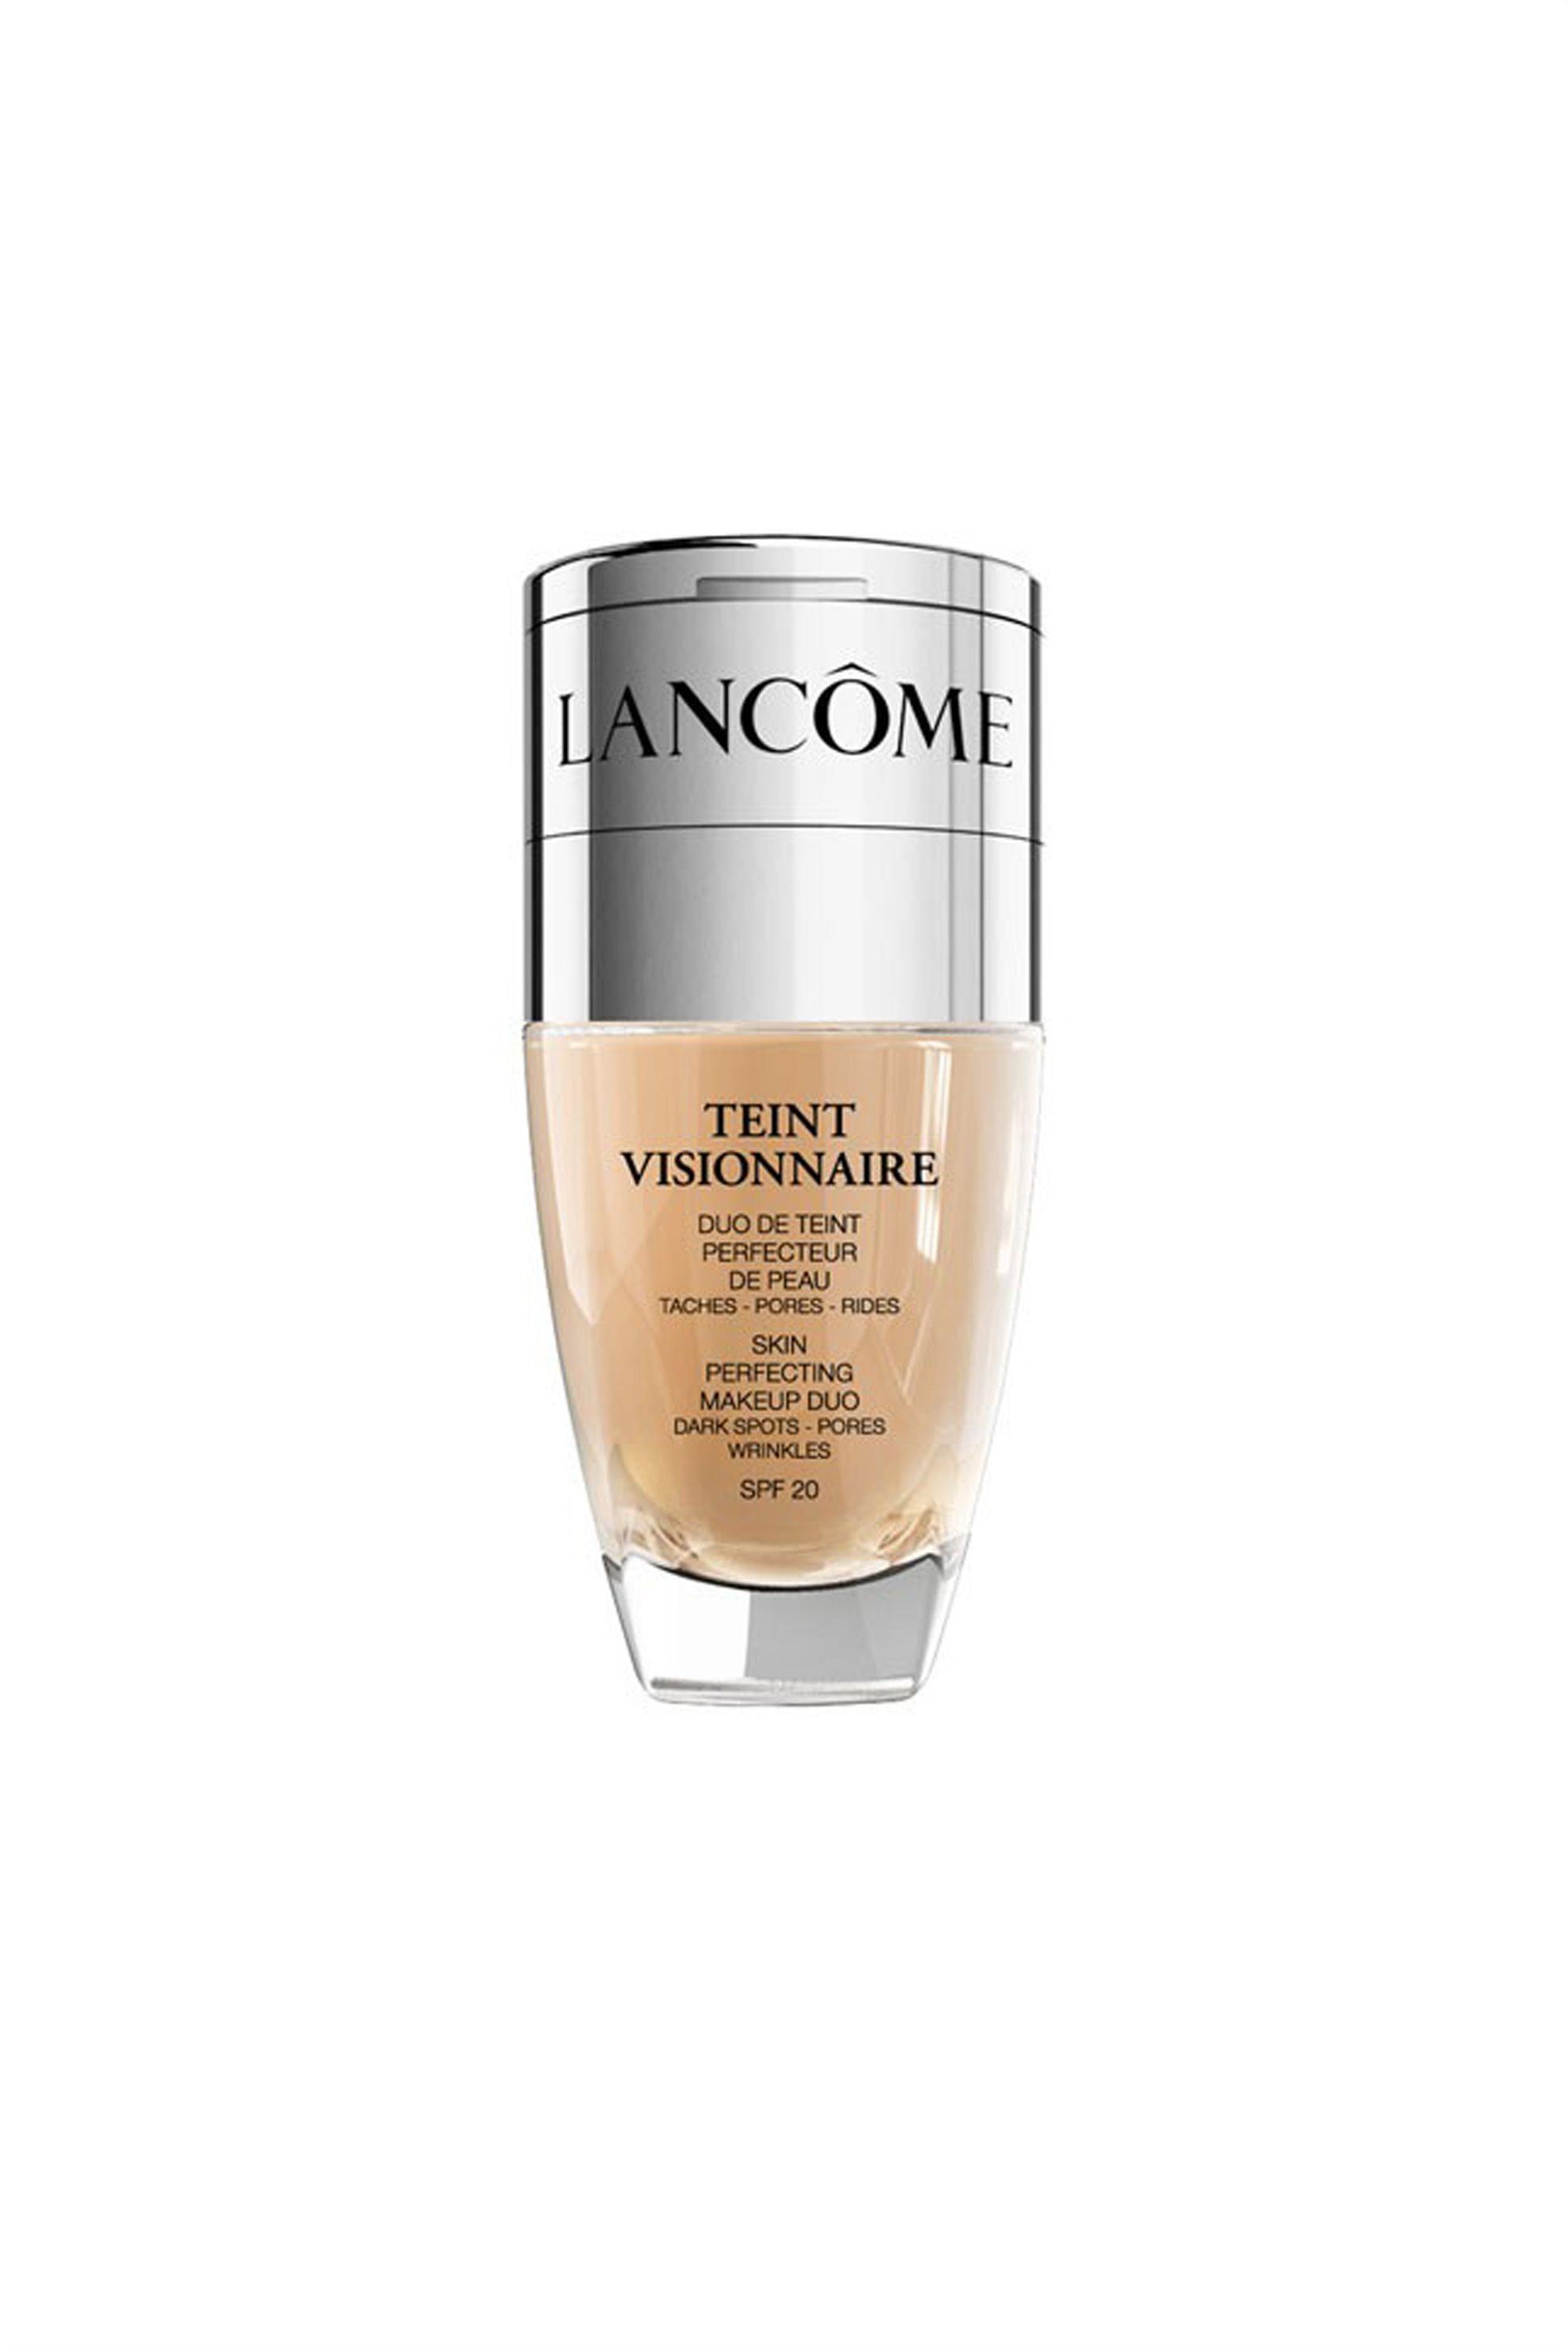 Lancôme Teint Visionnaire Skin Perfecting Makeup Duo 035 Beige Doré 30 ml - 3605 ομορφια   καλλυντικα επιλεκτικησ   μακιγιάζ   πρόσωπο   make ups   foundations